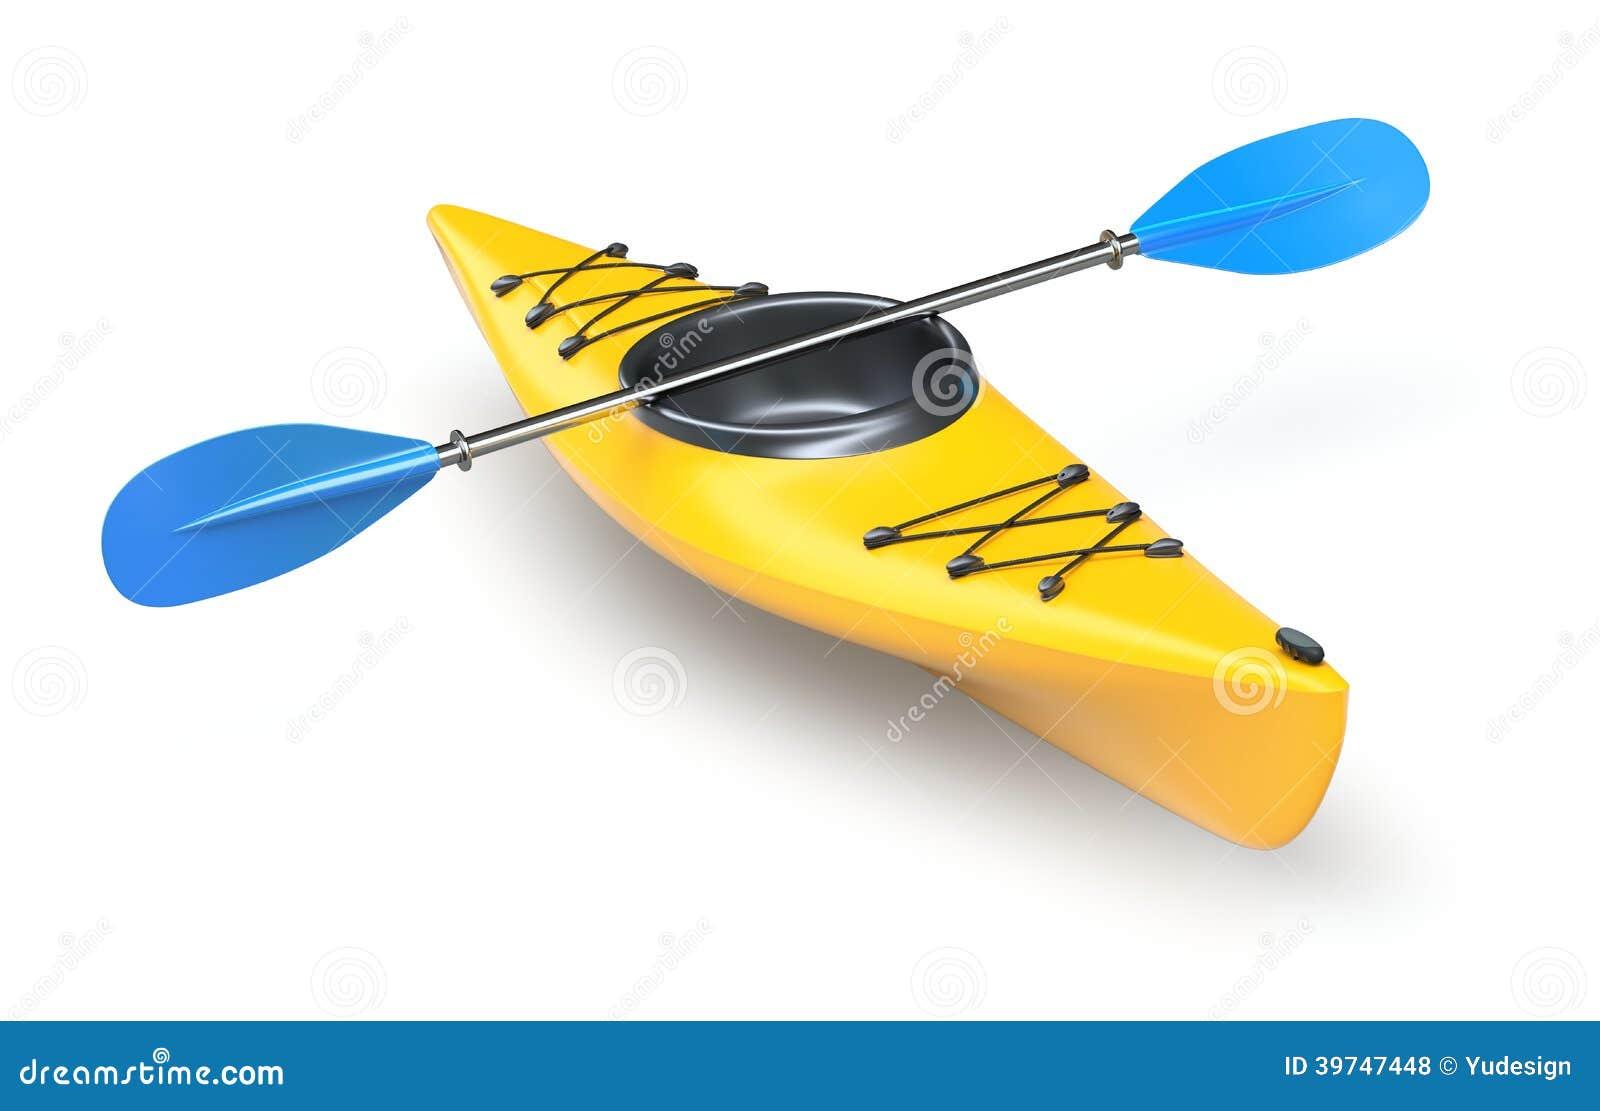 Kayak Photos Stock Inscription Gratuite